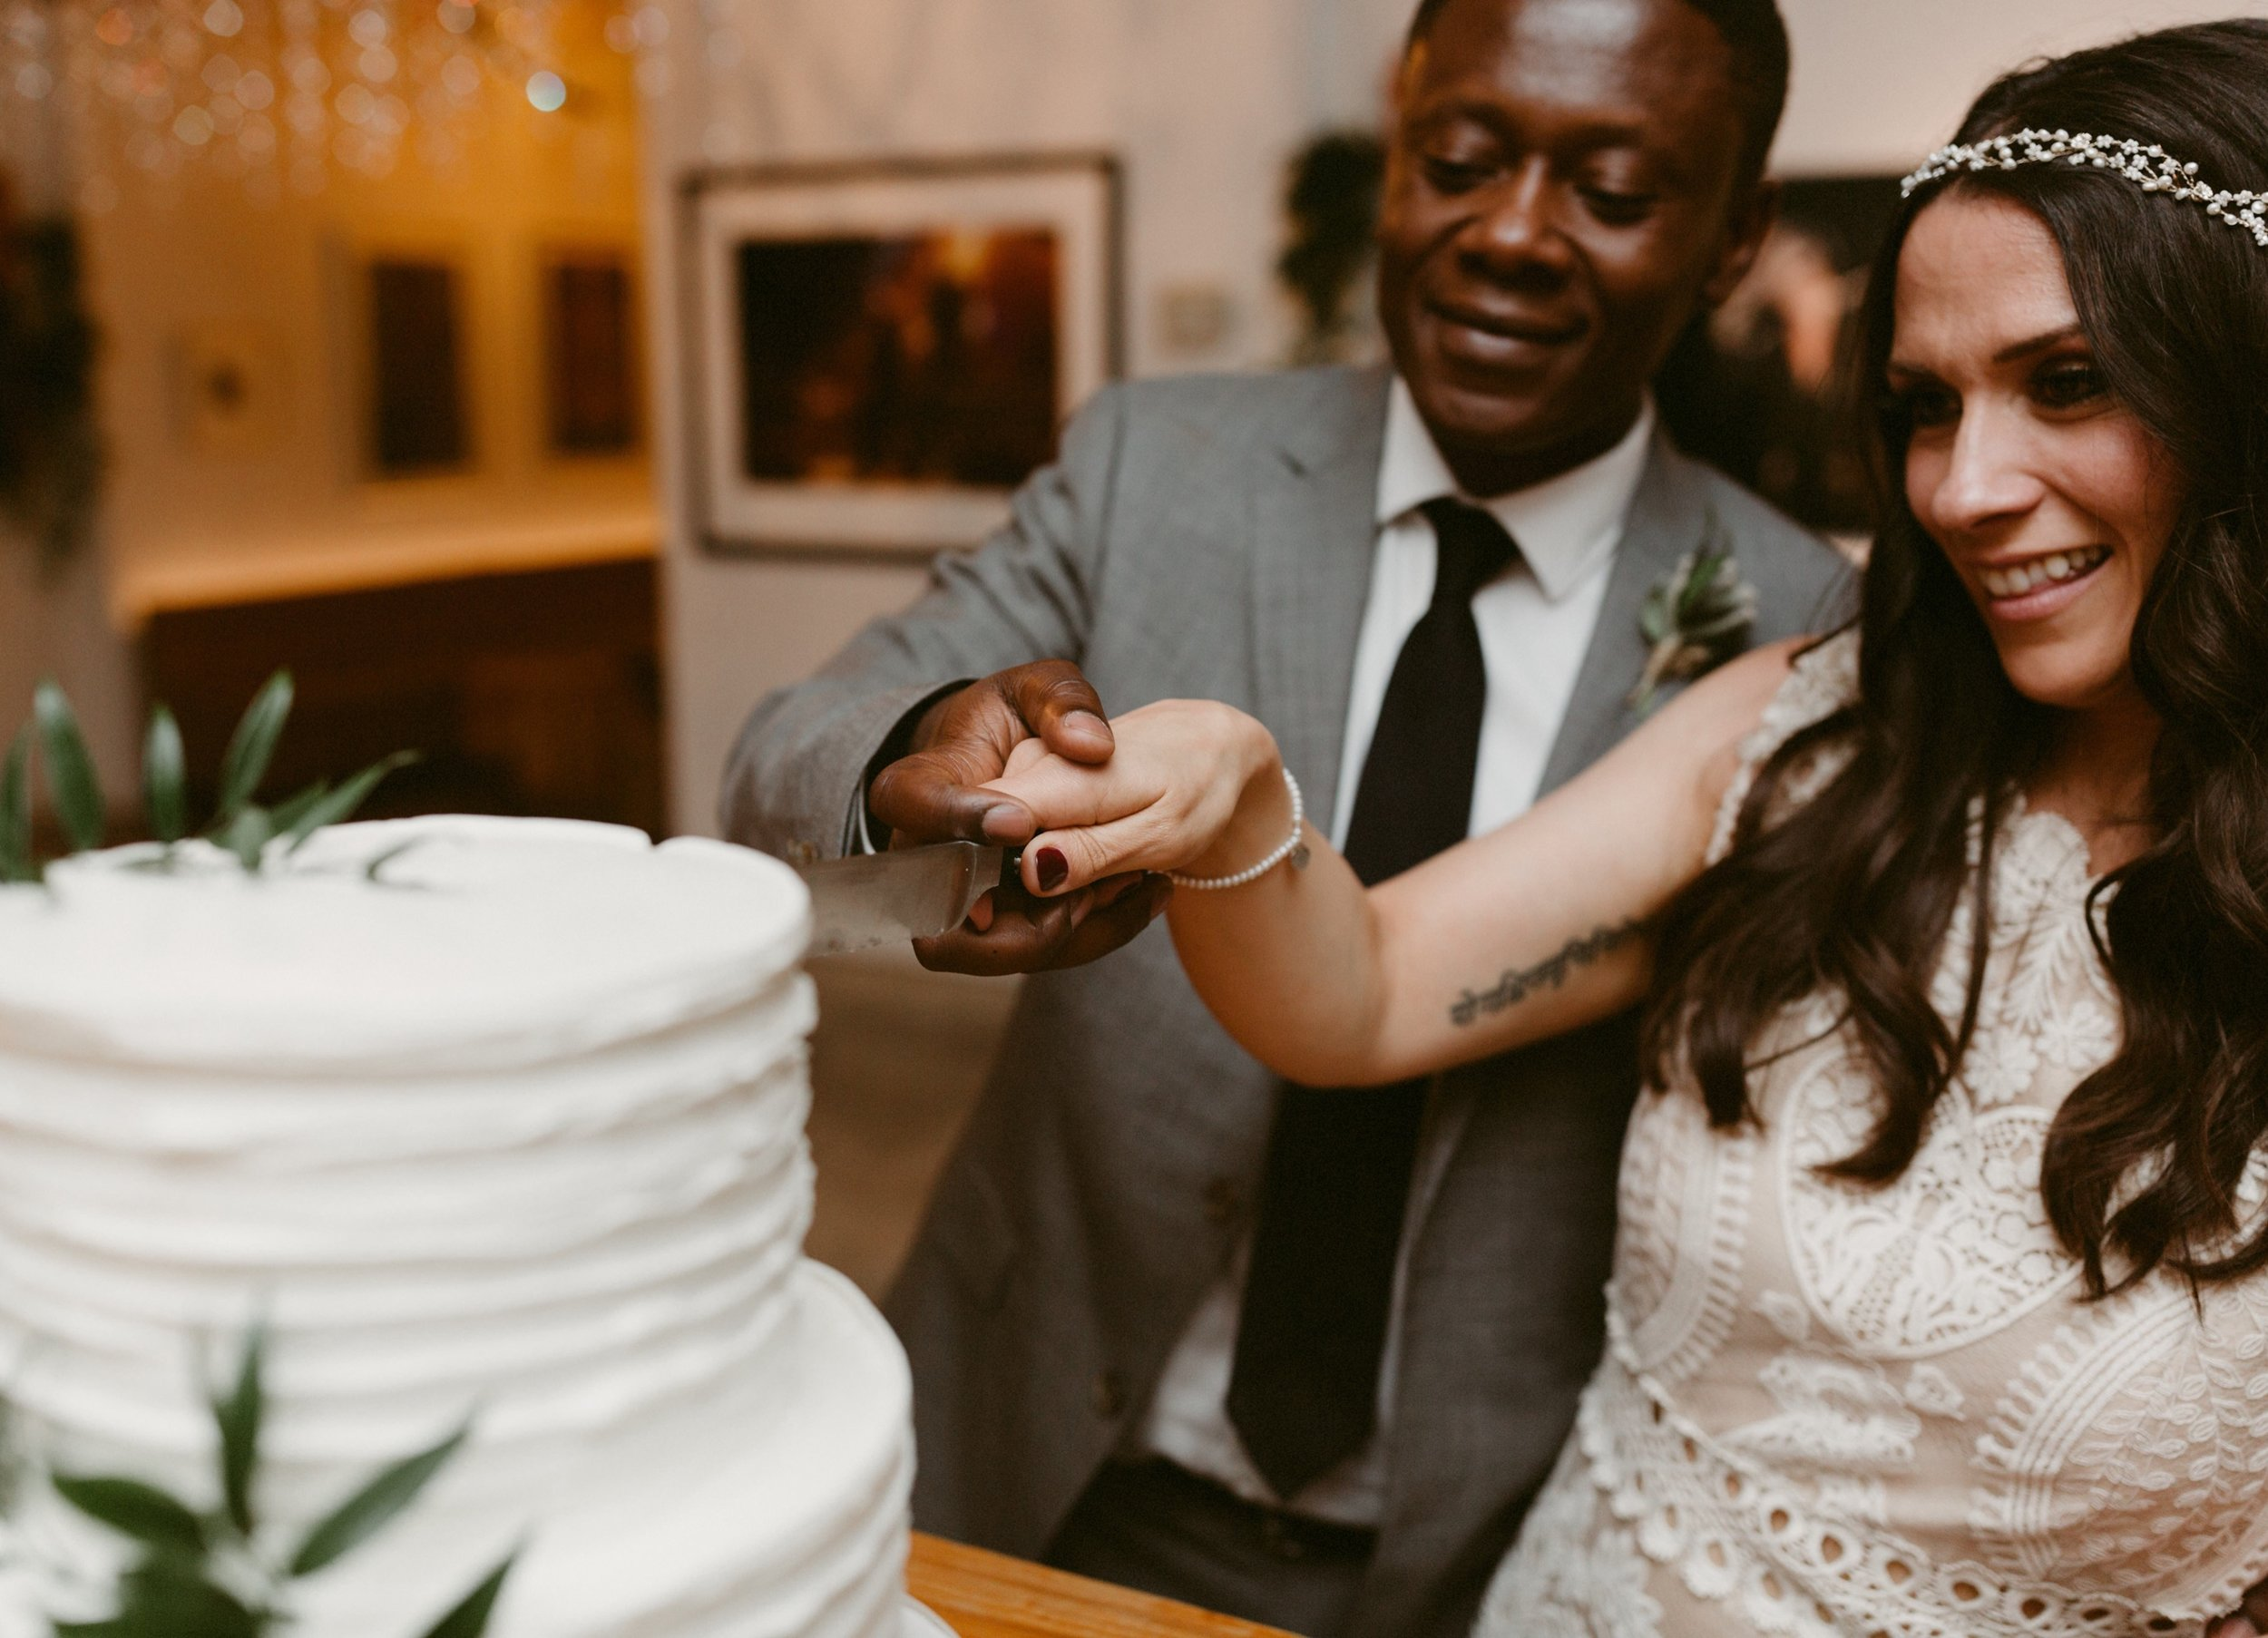 115_Spadina House Wedding (674 of 748)_intimate_Boehmer_Restaurant_Toronto_Wedding.jpg